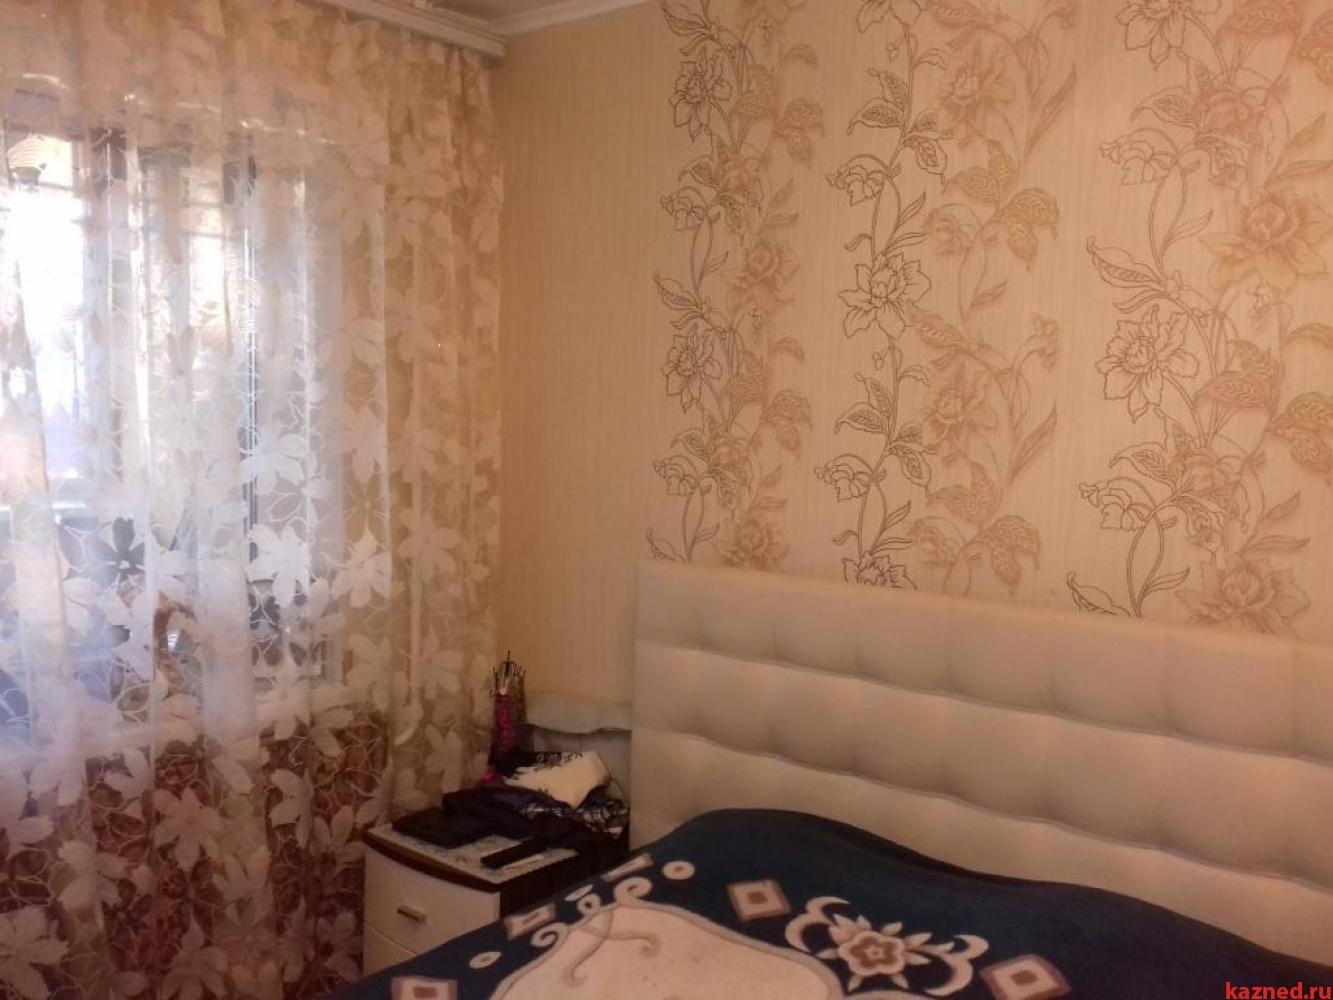 Продажа 3-к квартиры Лукина, 16, 69 м² (миниатюра №5)